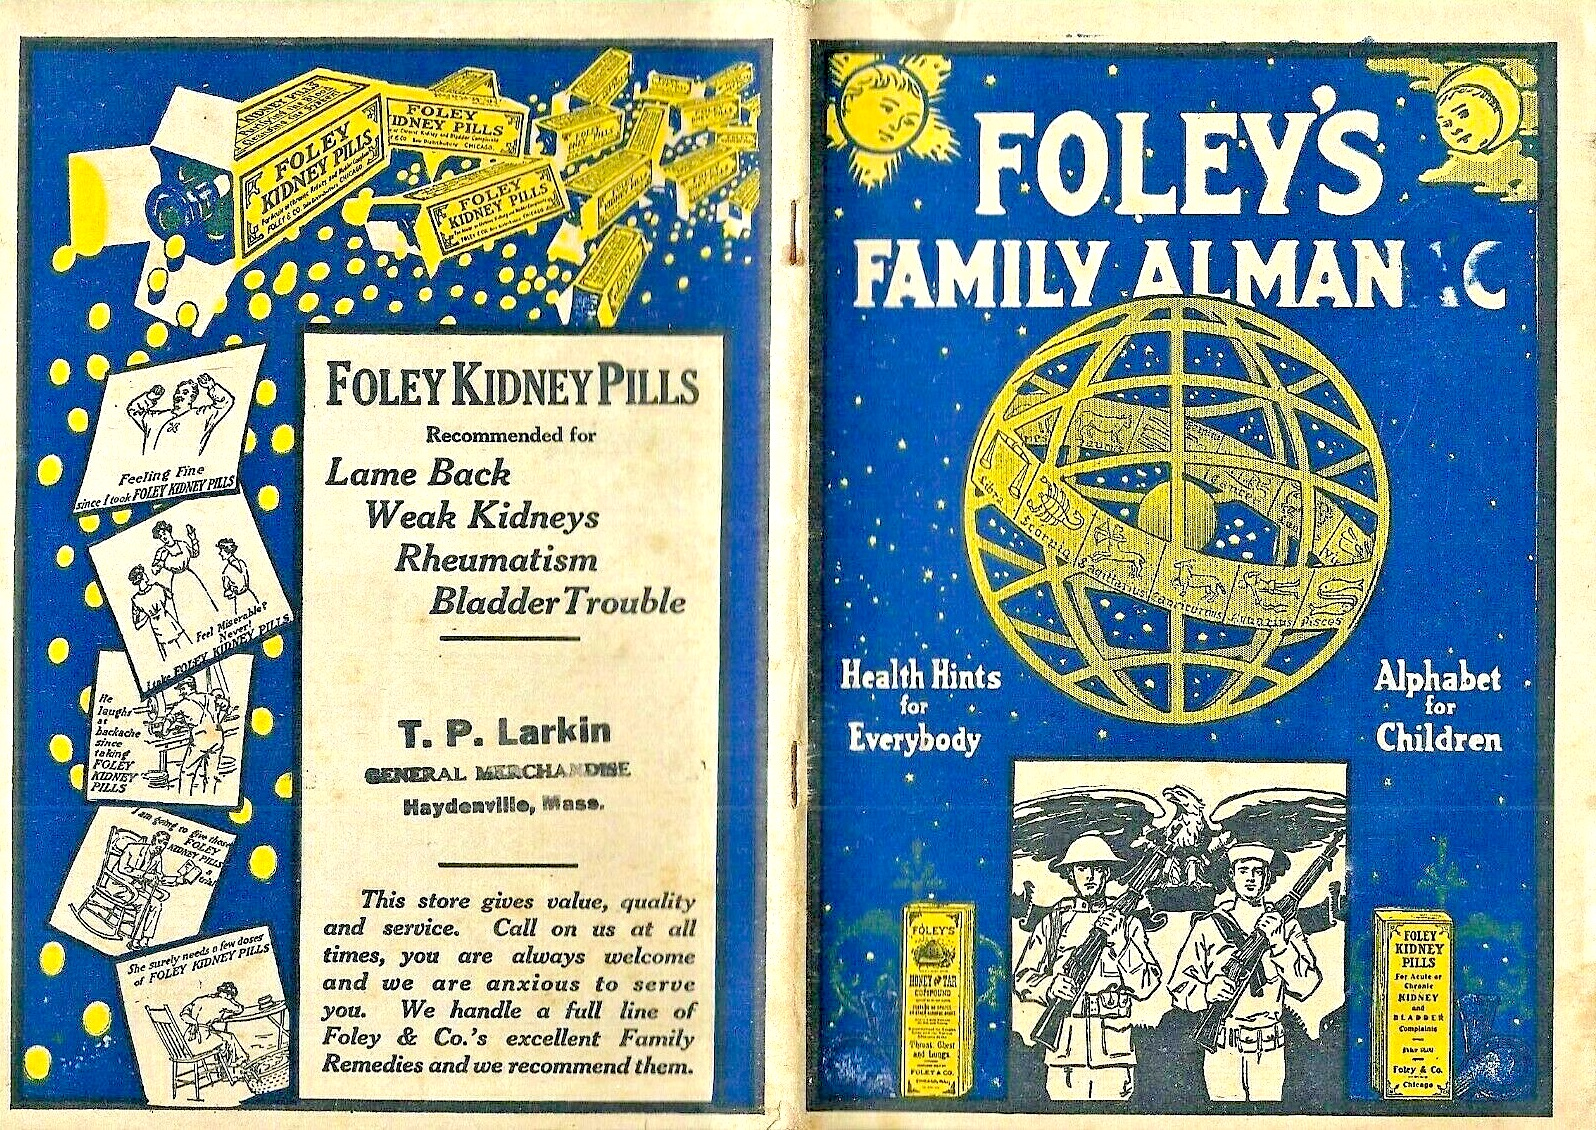 Foley Family Almanac 1918